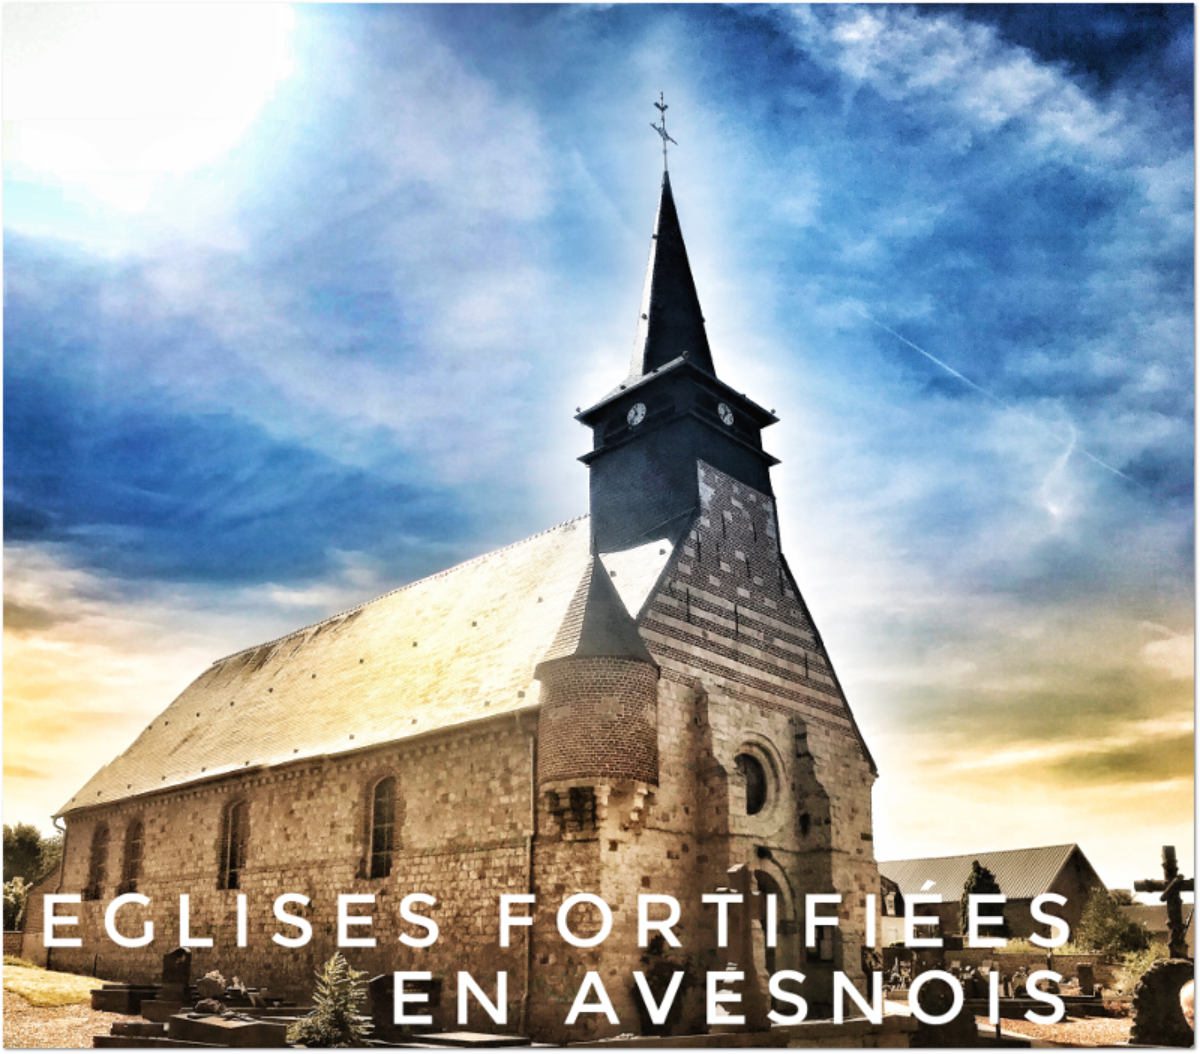 Eglises fortifiées en Avesnois